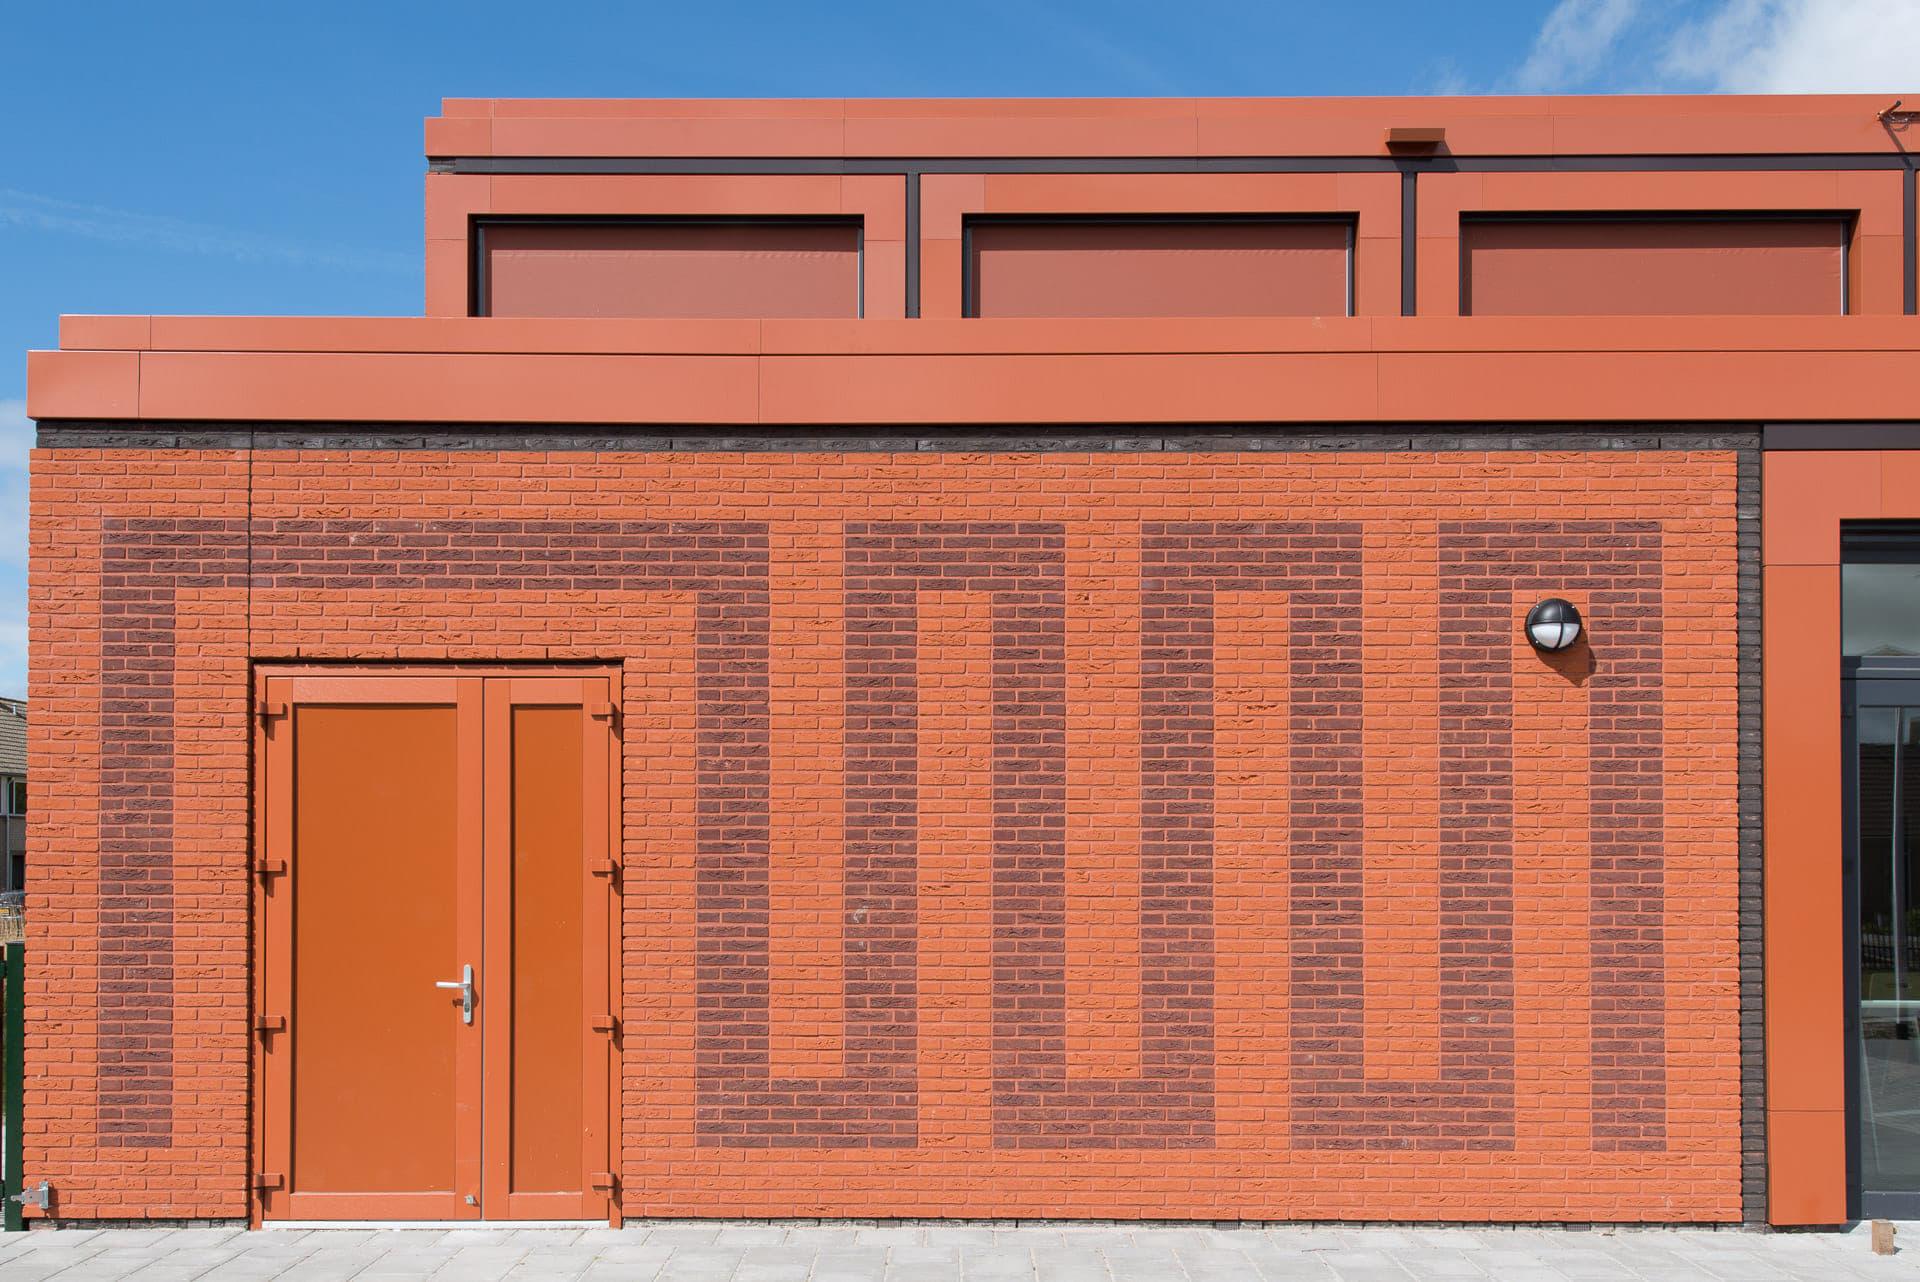 Rode gevel met tekening in het metselwerk en een rode deur